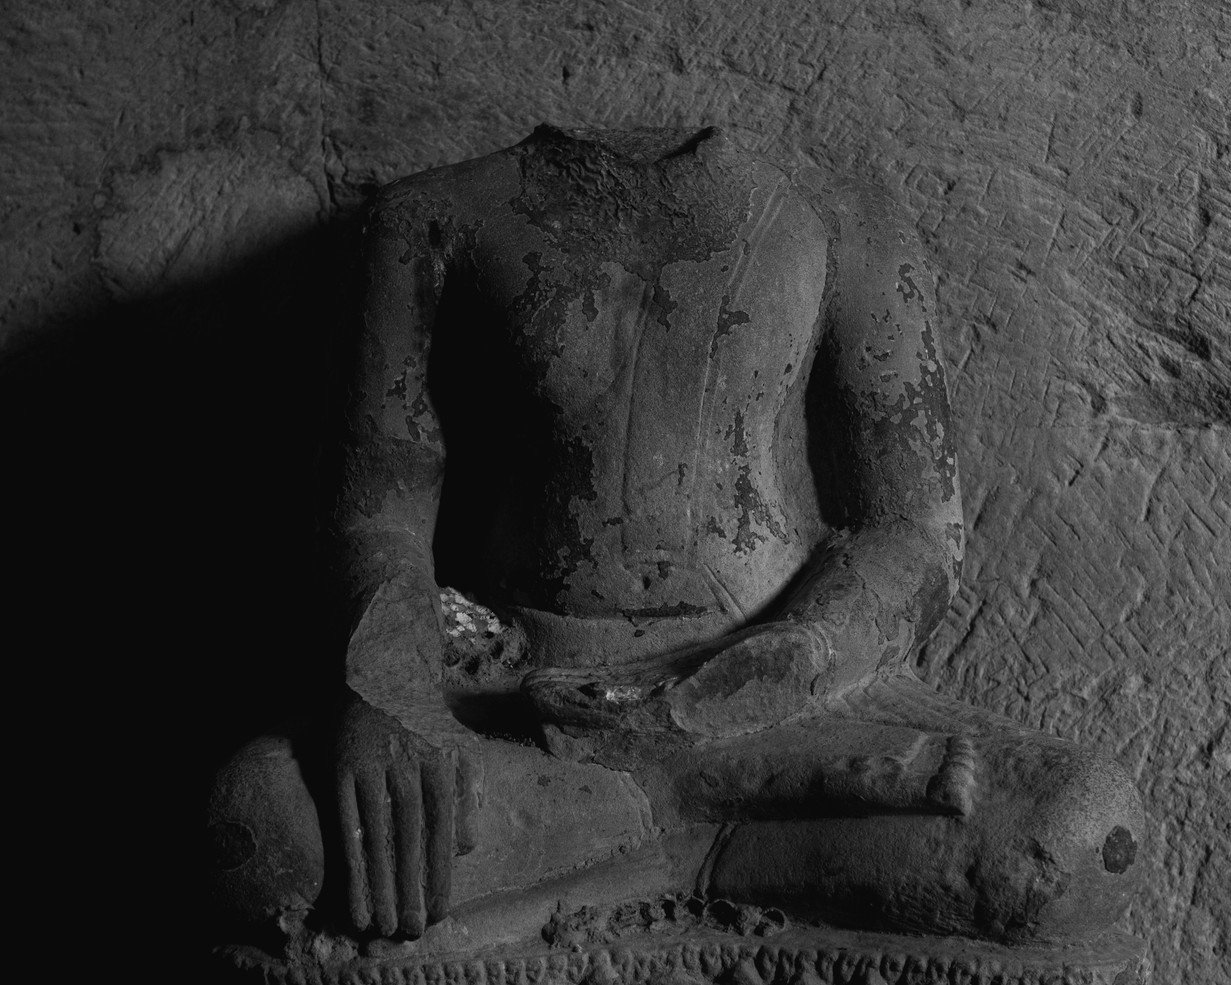 08_20120801_Cambodia SiemReap_0629.JPG